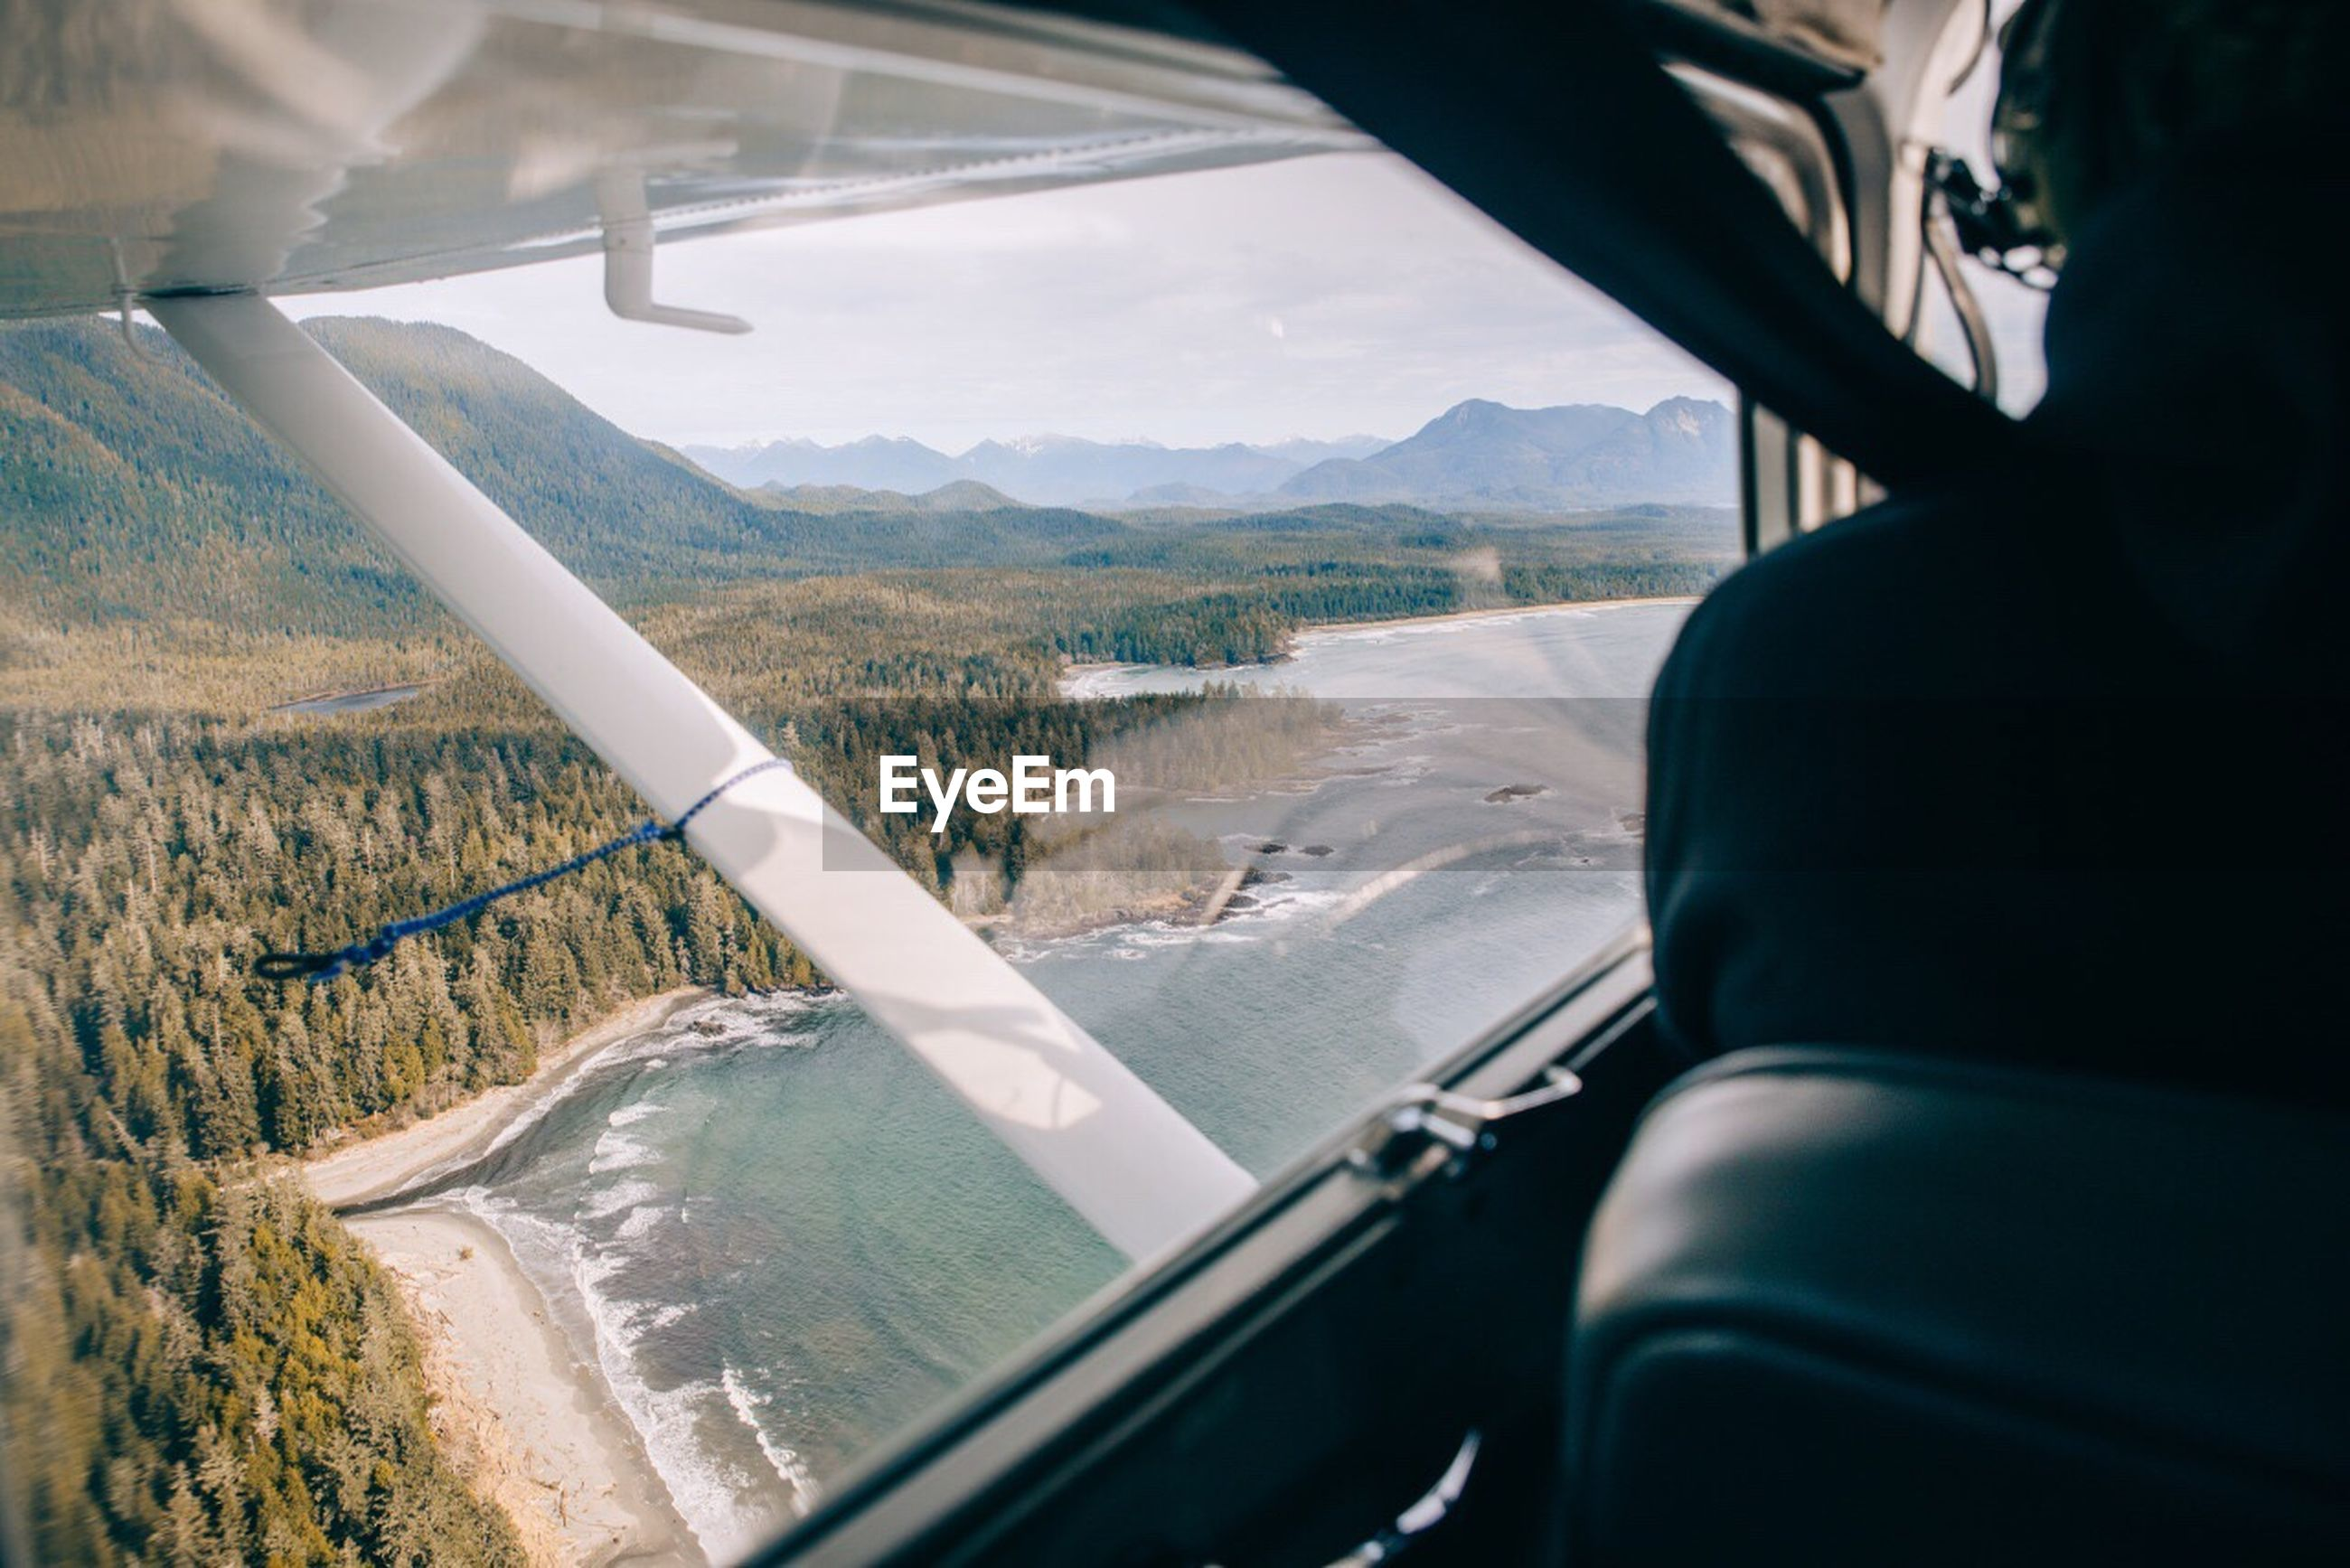 Scenic view of sea seen through airplane window